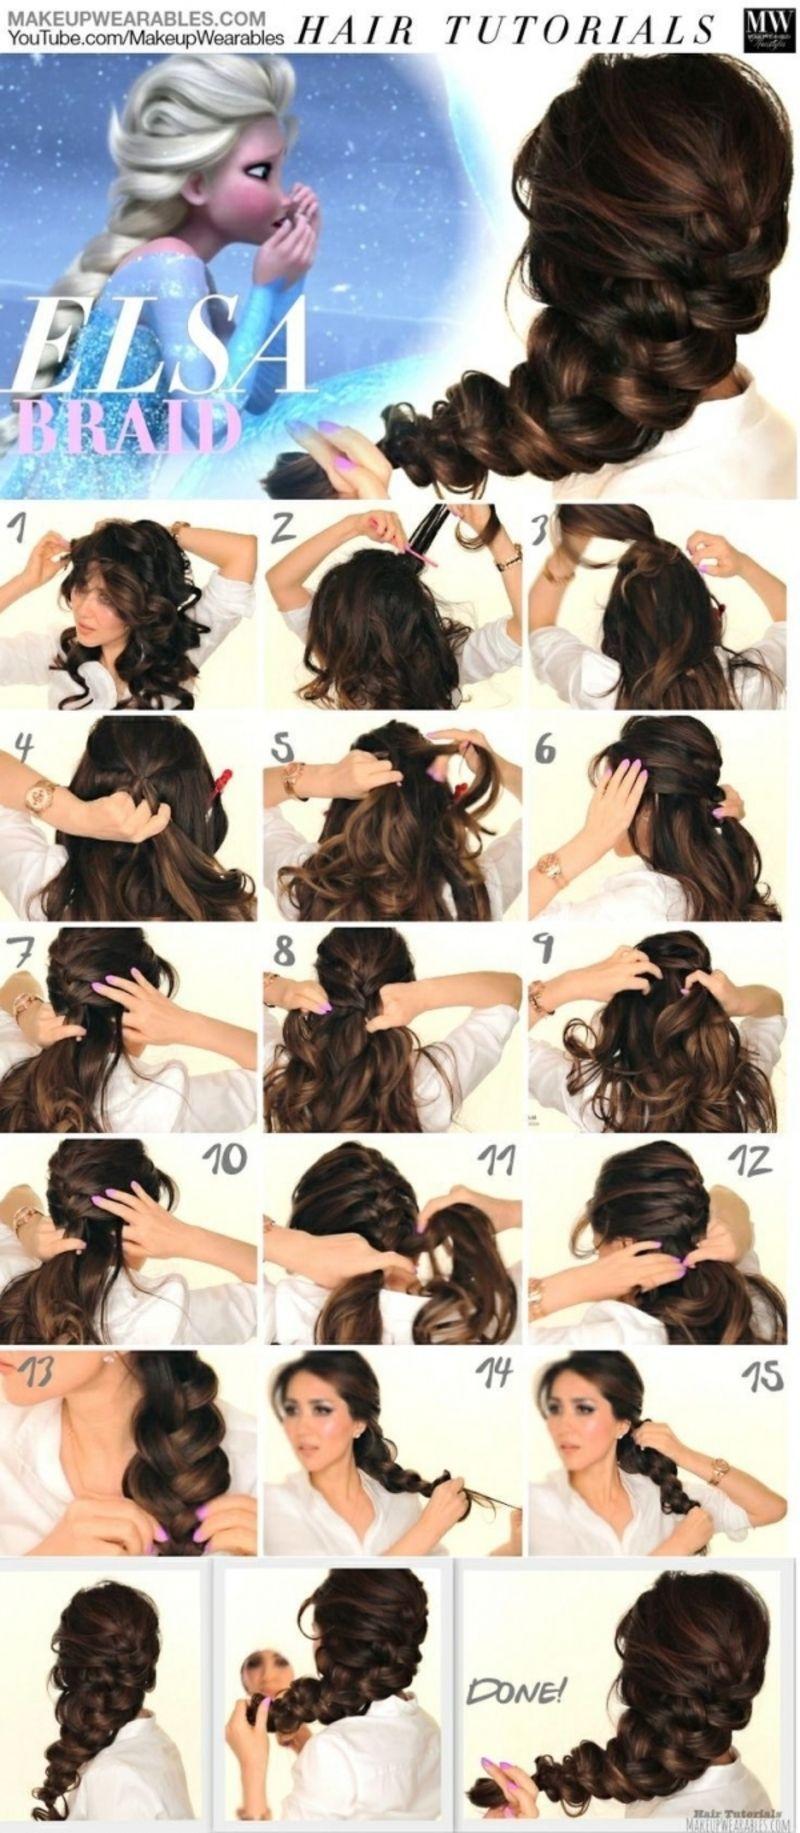 Elsa Braid - Fancy Braided Hairstyle,Bun French Hairstyle Triple Braided